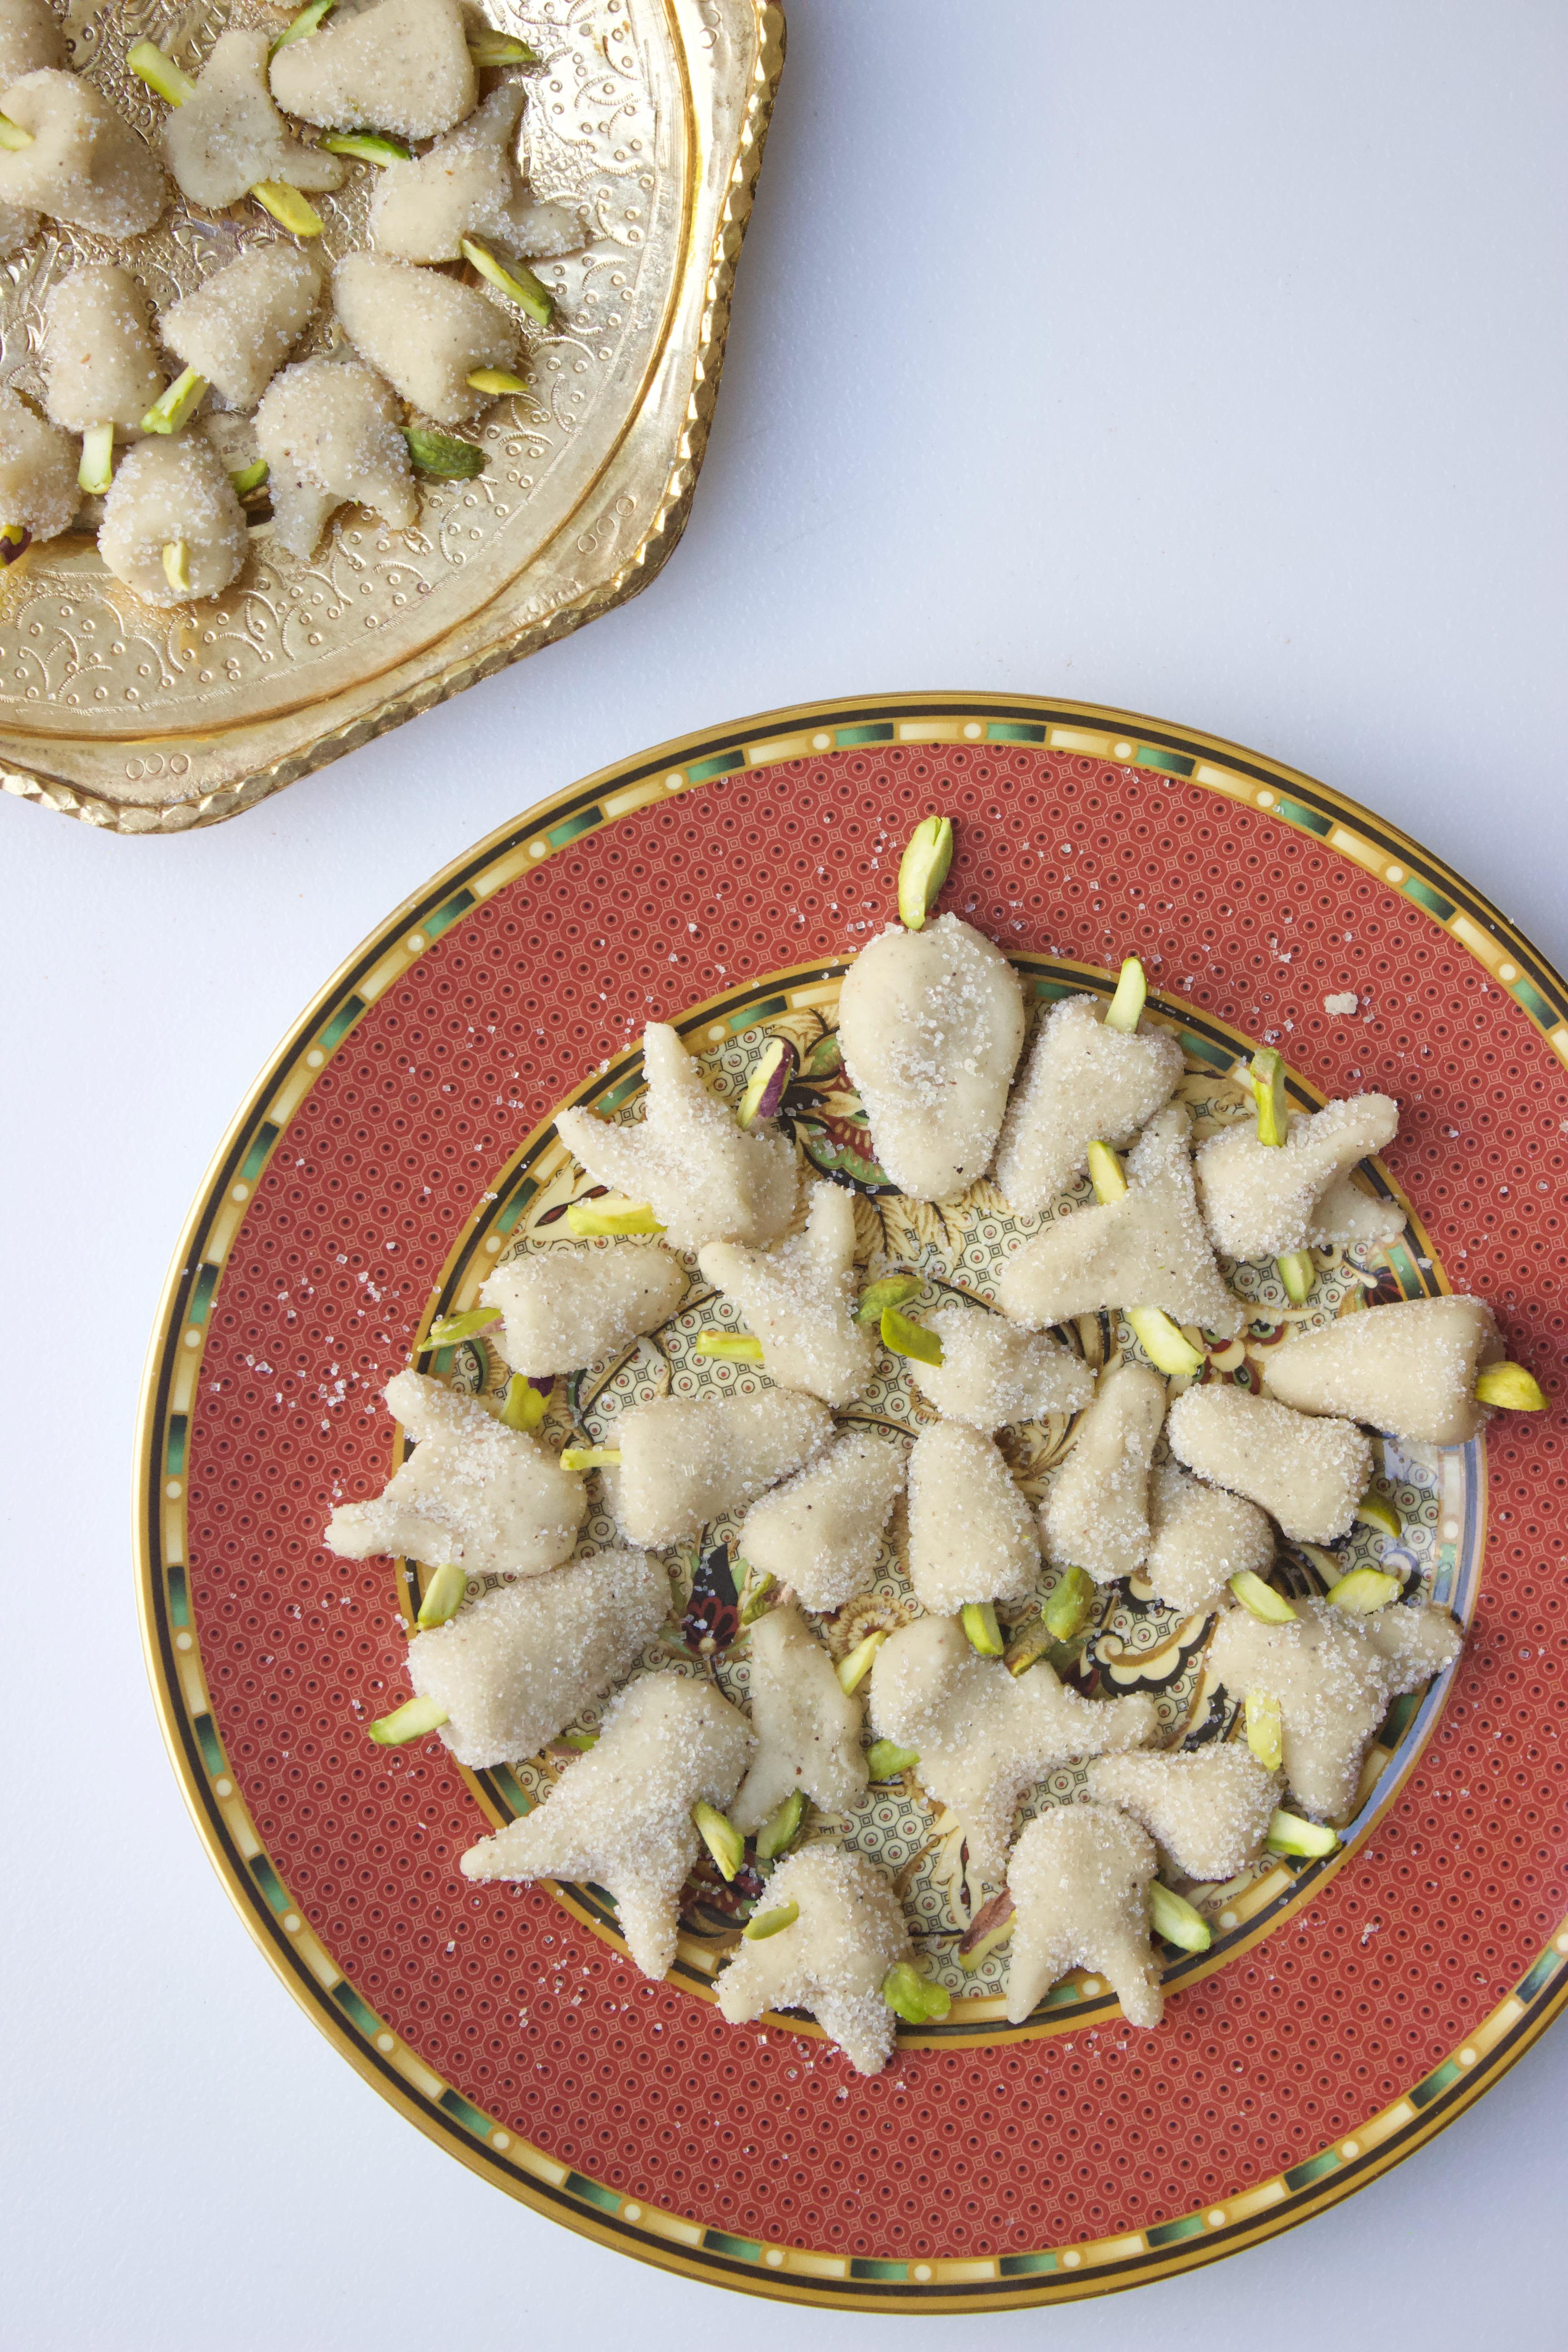 Tut (Persian Marzipan)